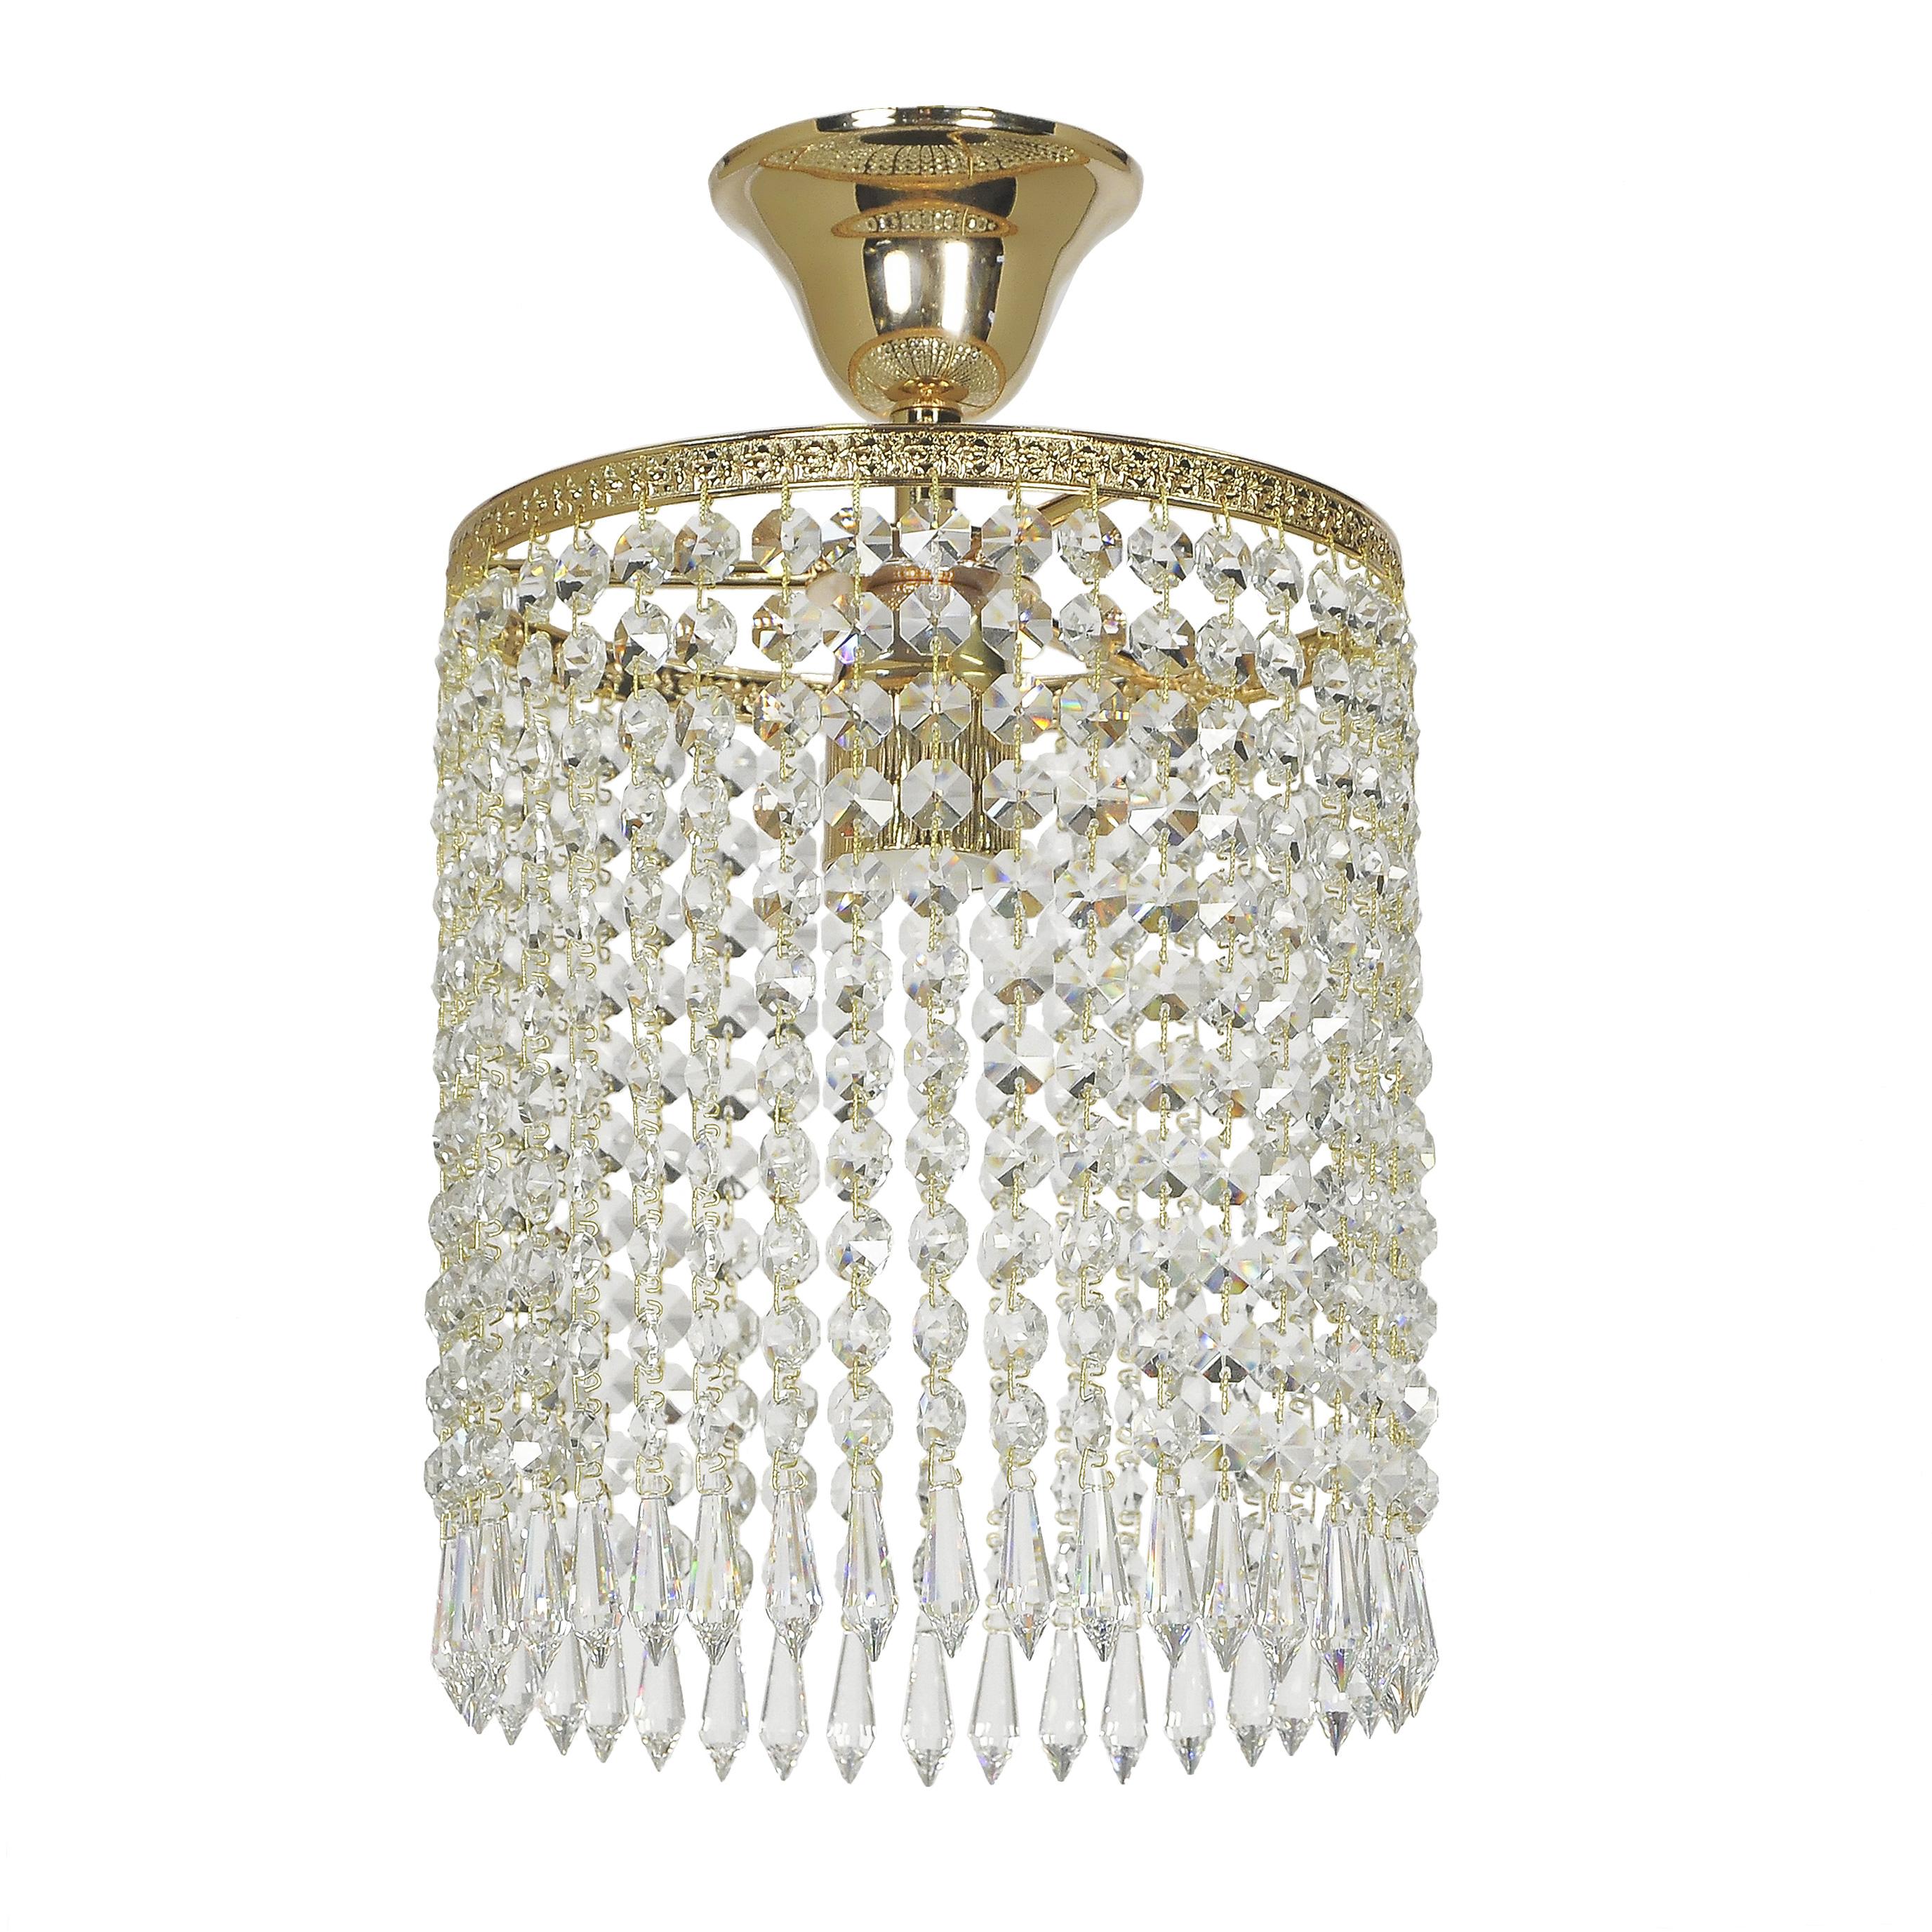 Люстра Arti lampadari Stella e 1320501 g